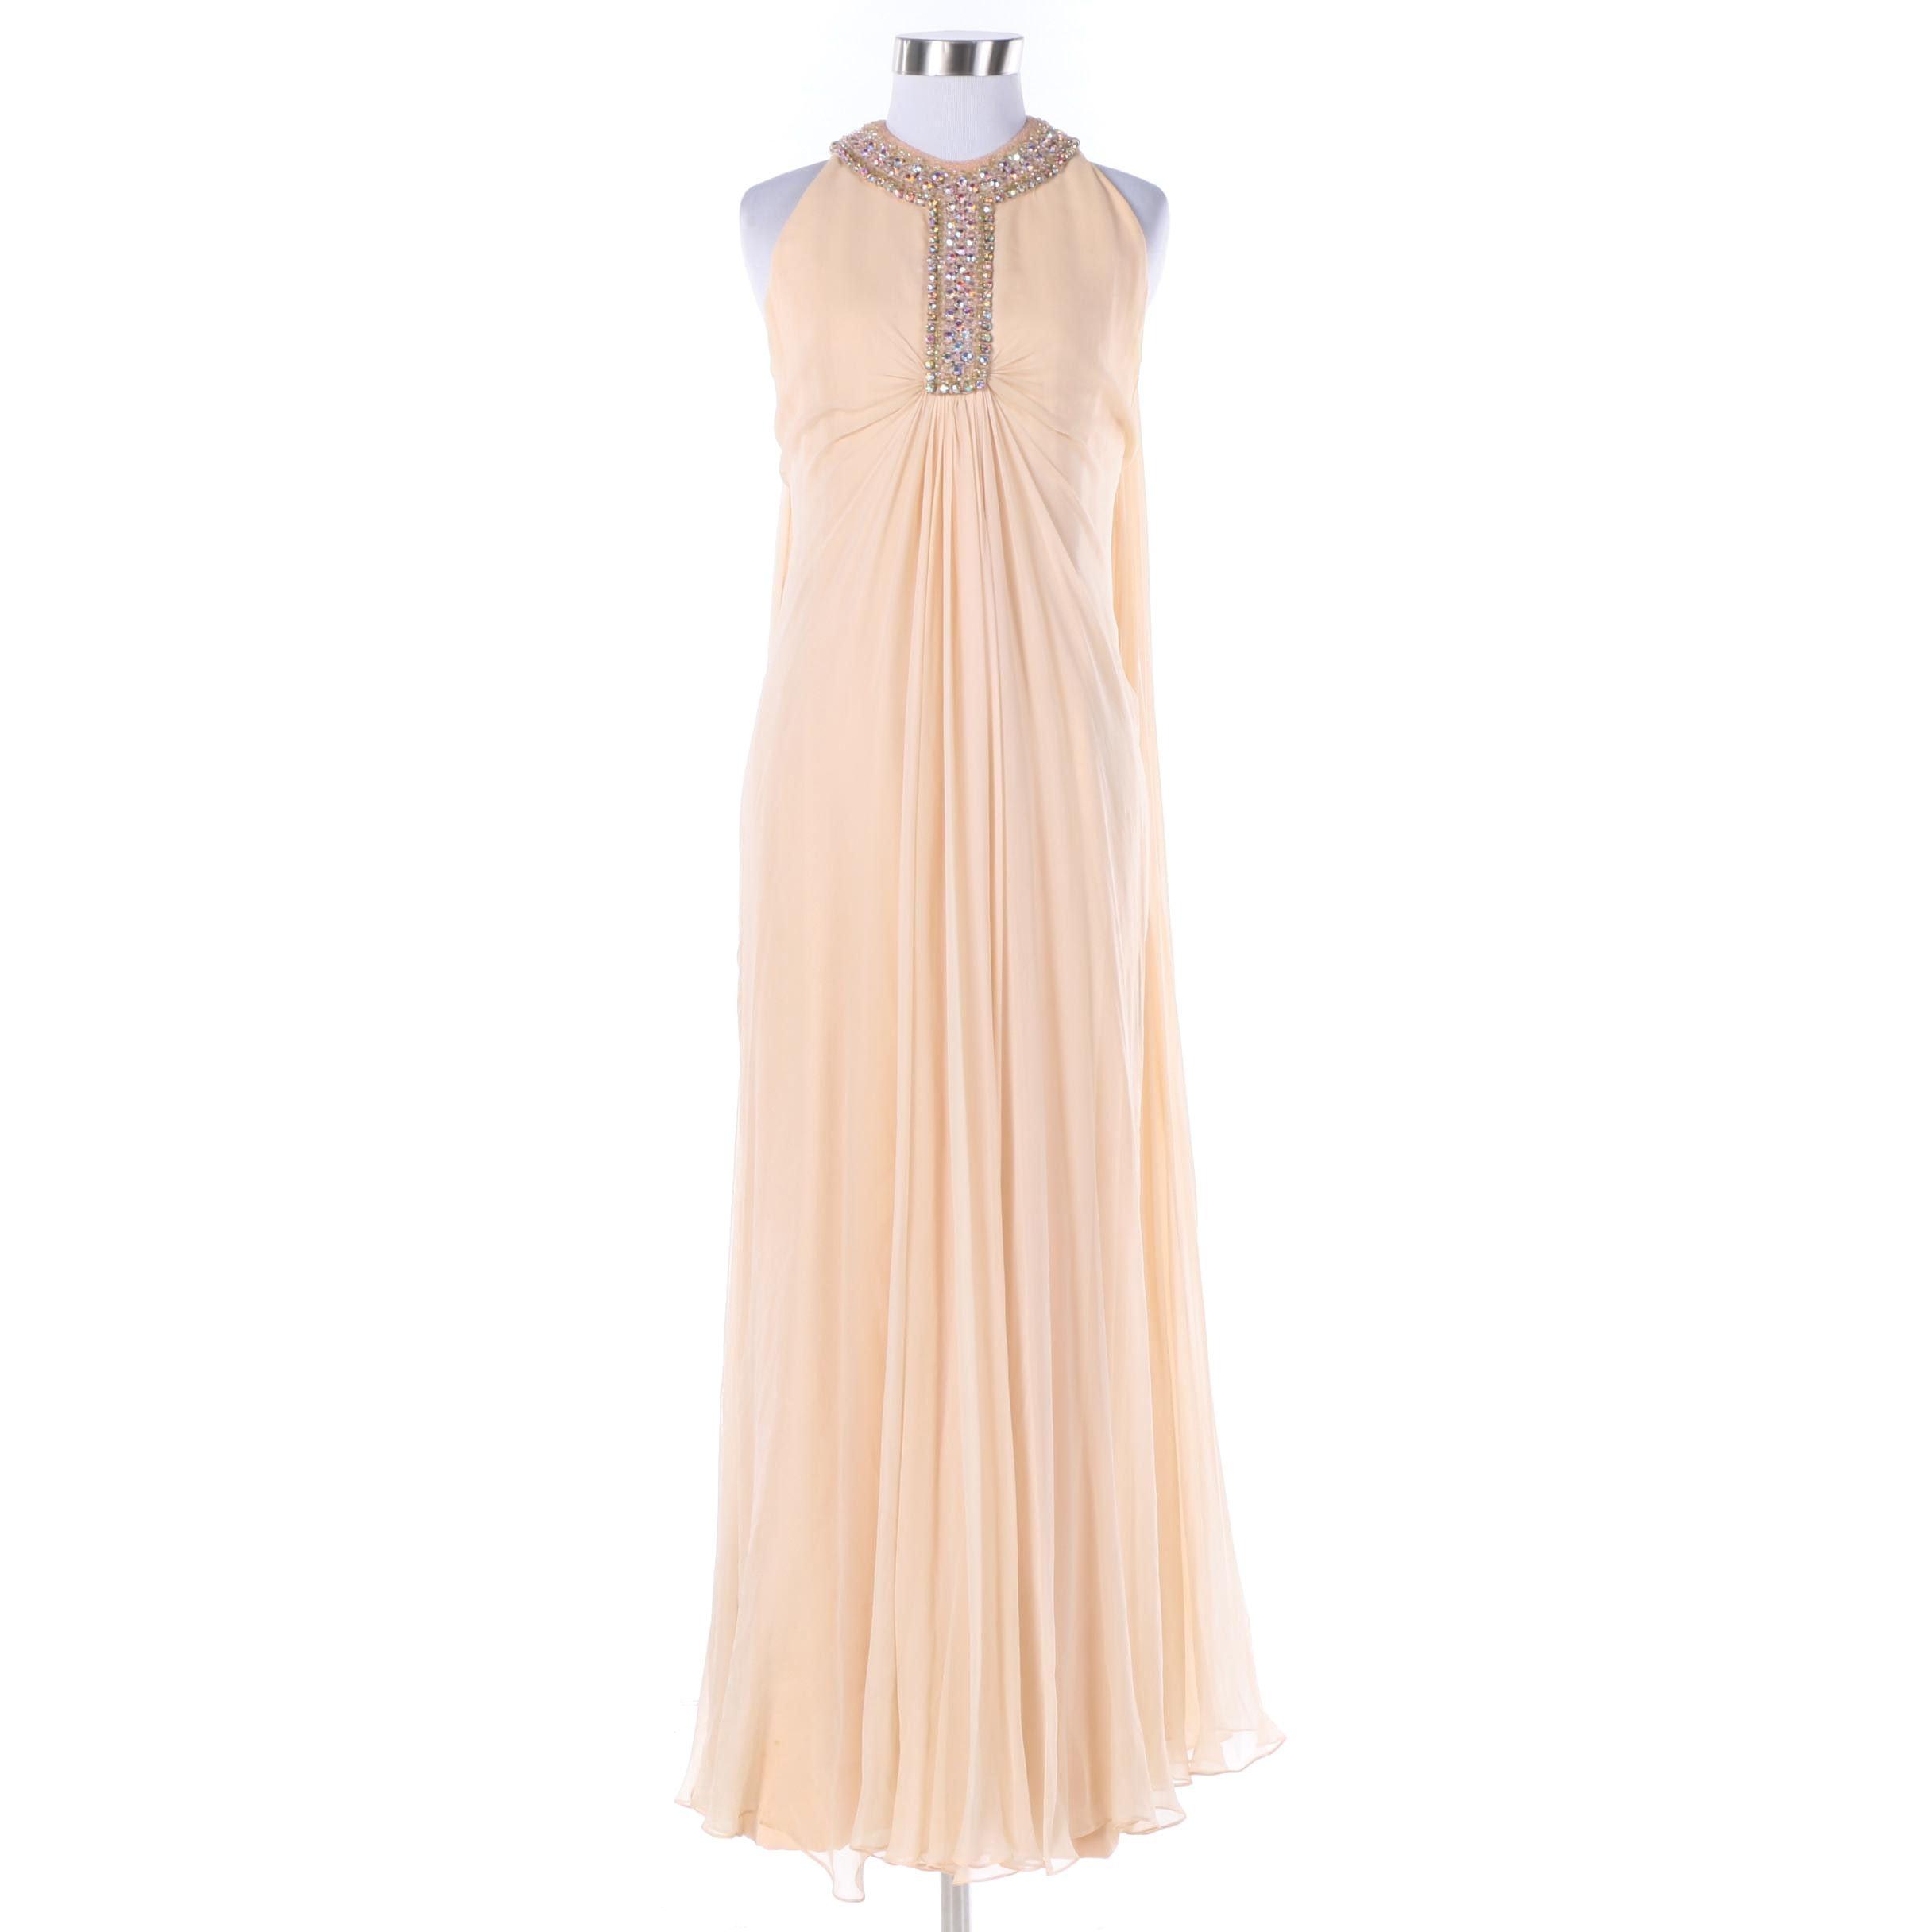 Circa 1970s Vintage Davidson's Indiana Pink Crepe Chiffon Evening Gown